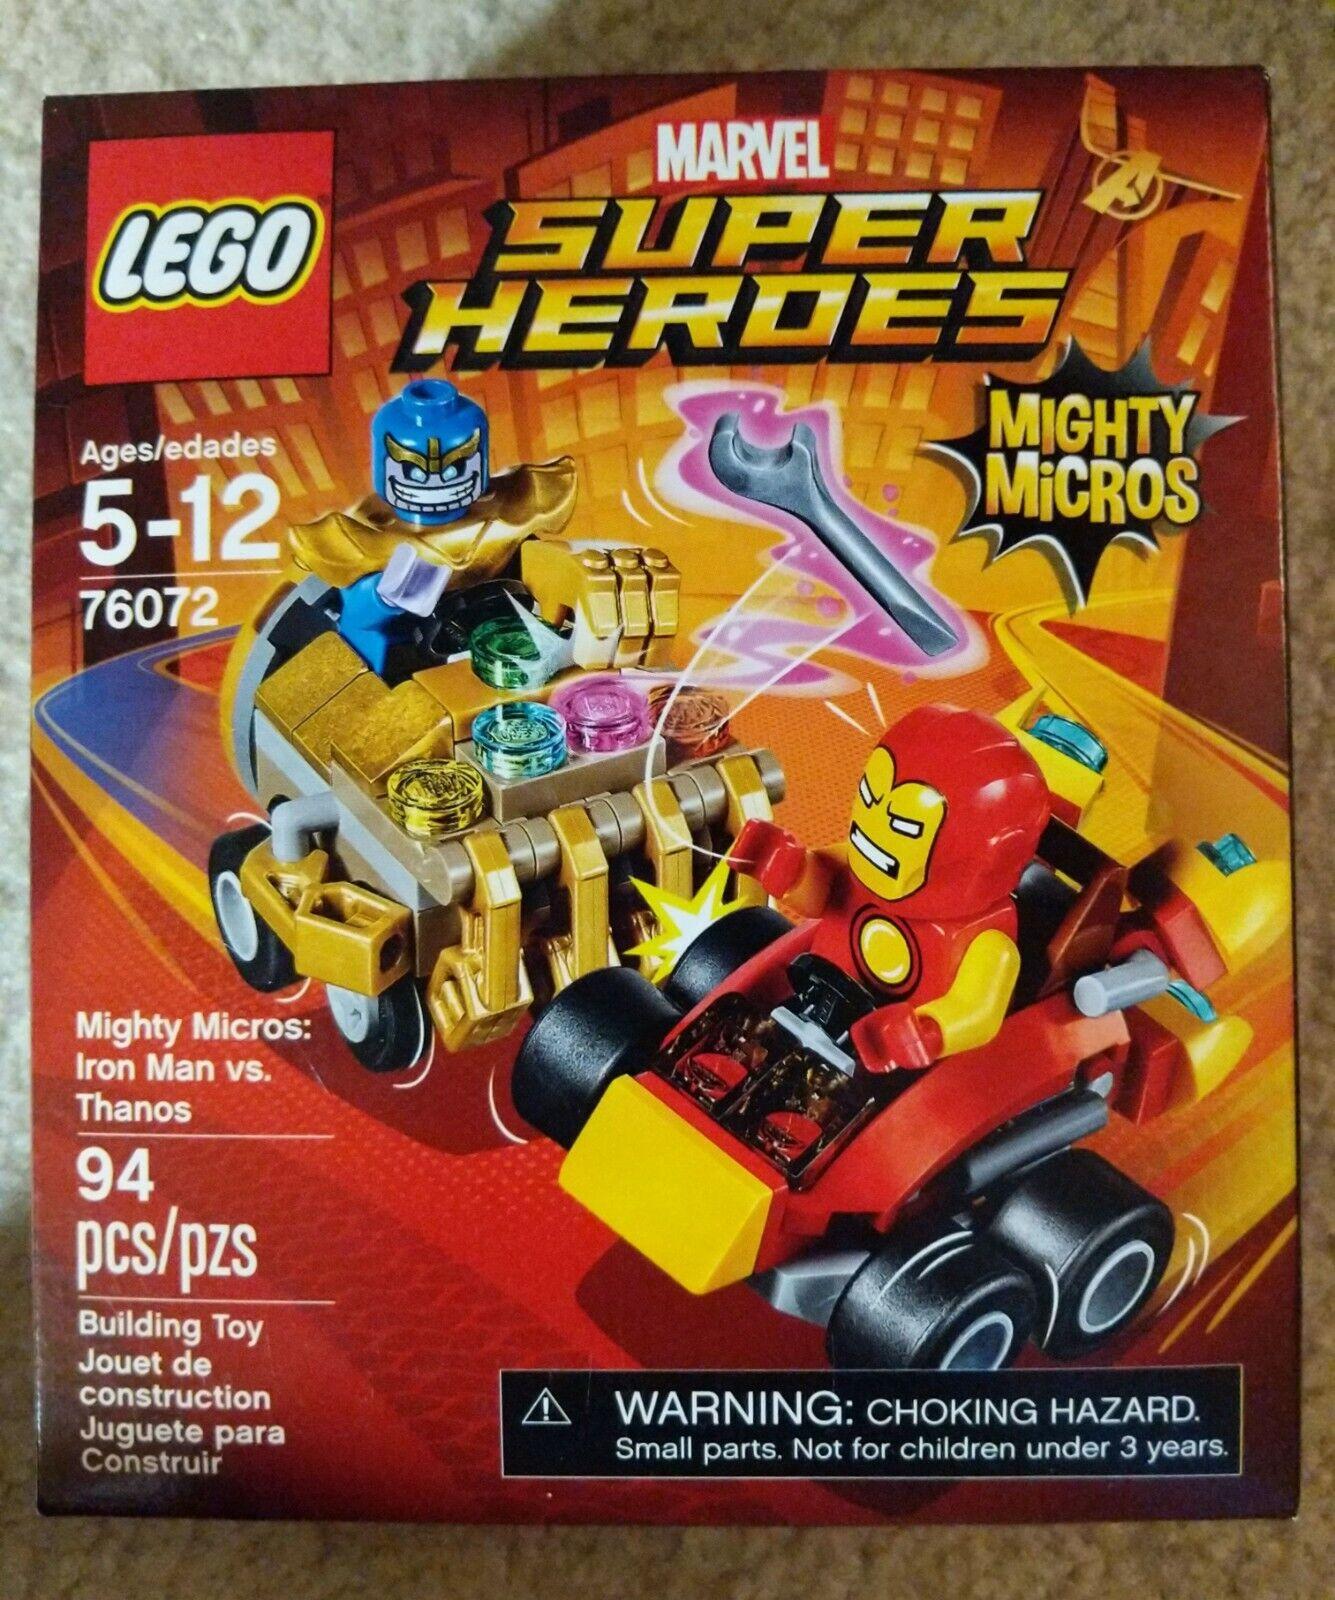 NEU /& OVP ! Scorpion Spider-Man vs 76071 Mighty Micros LEGO® Mighty Micros